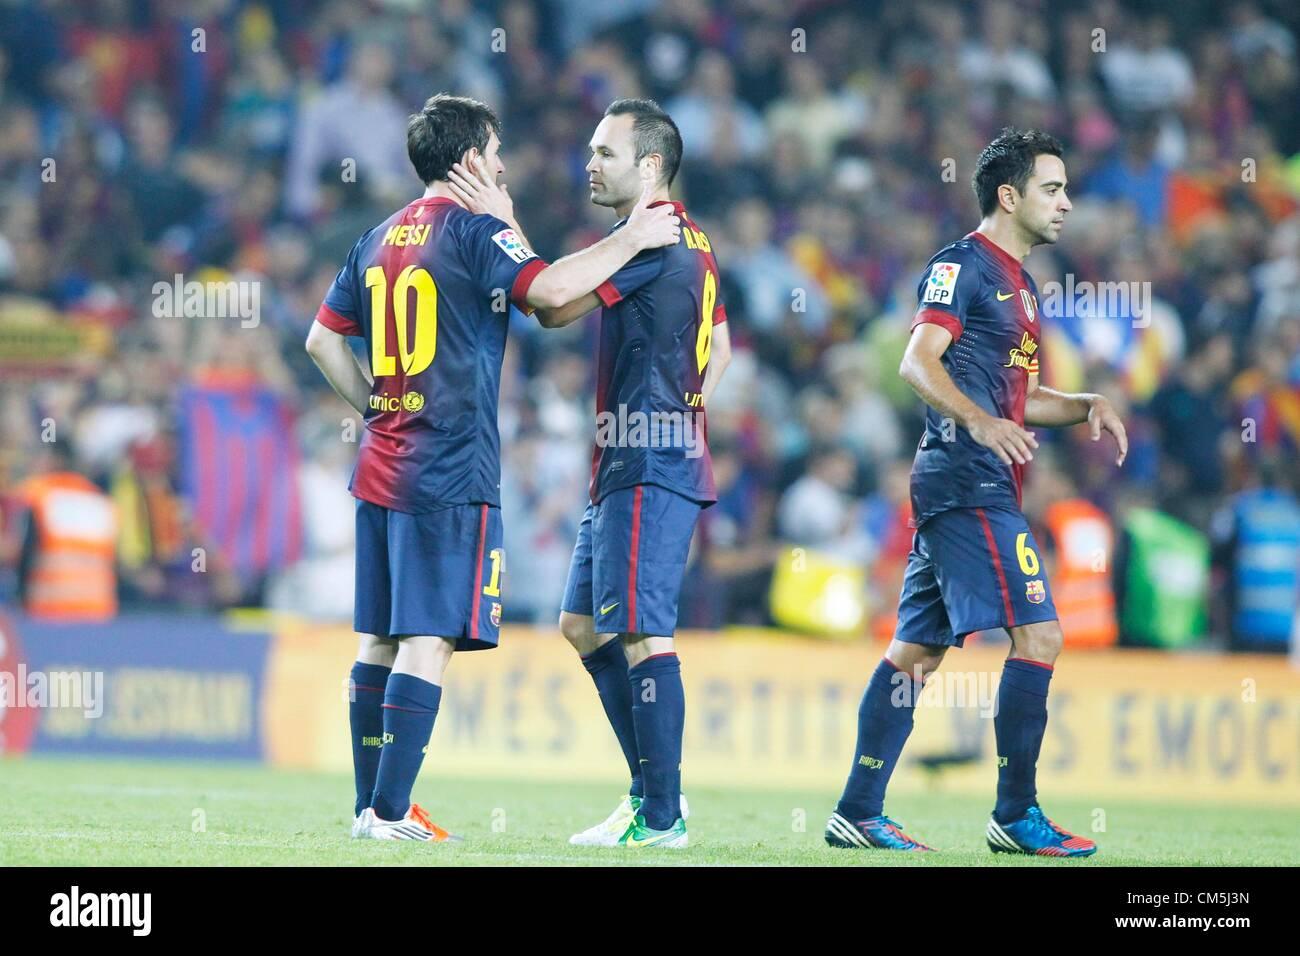 61ffc10d5 Lionel Messi